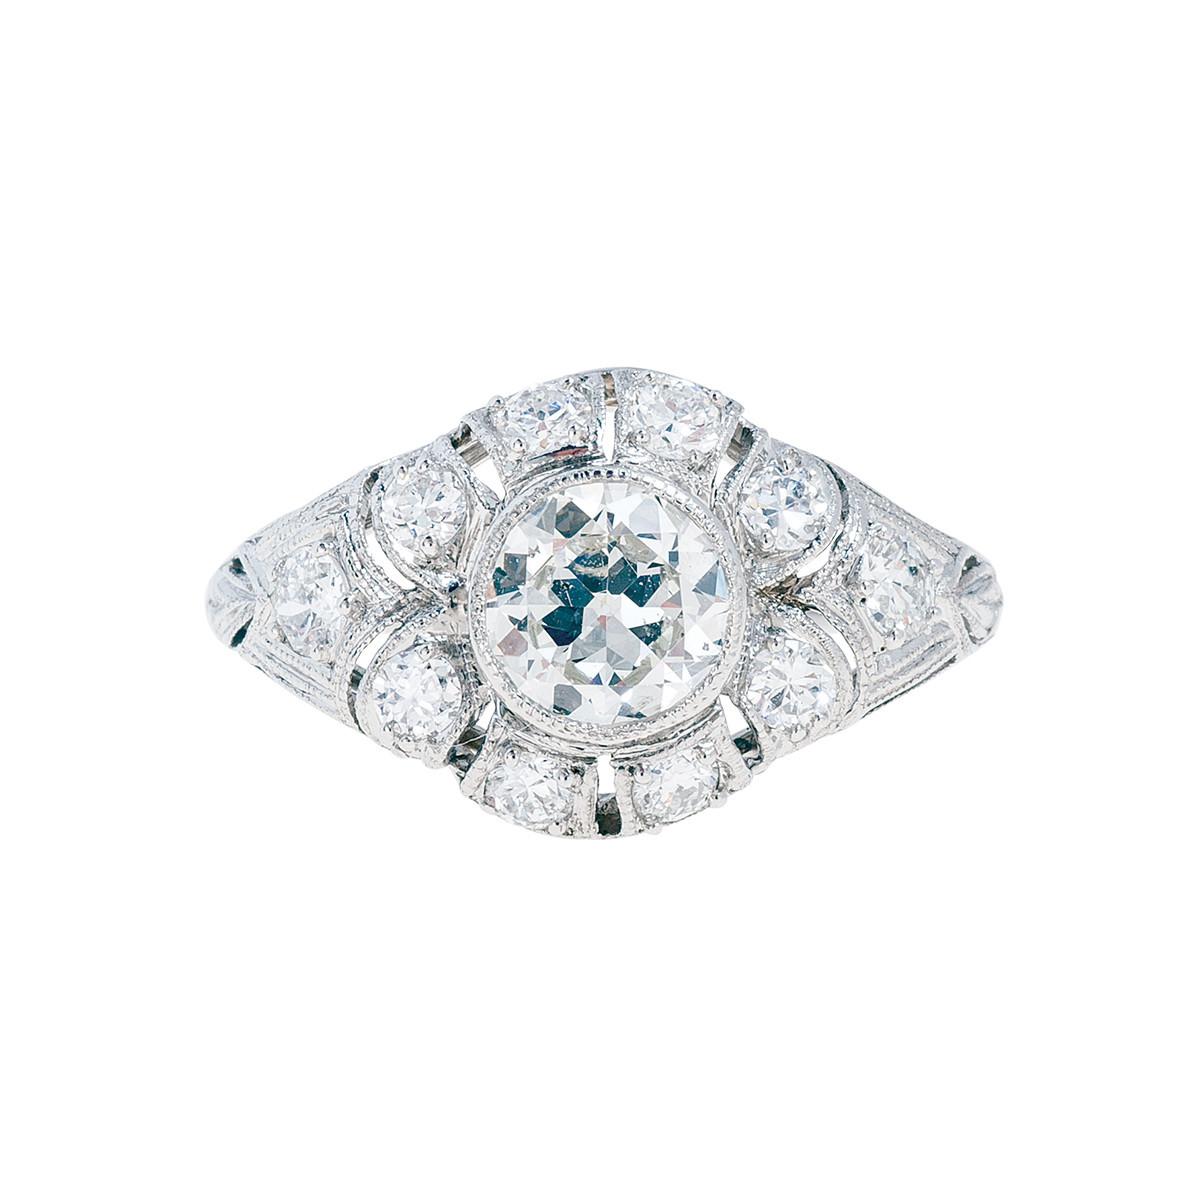 Antique Edwardian 1.30 CTW Diamond Engagement Ring